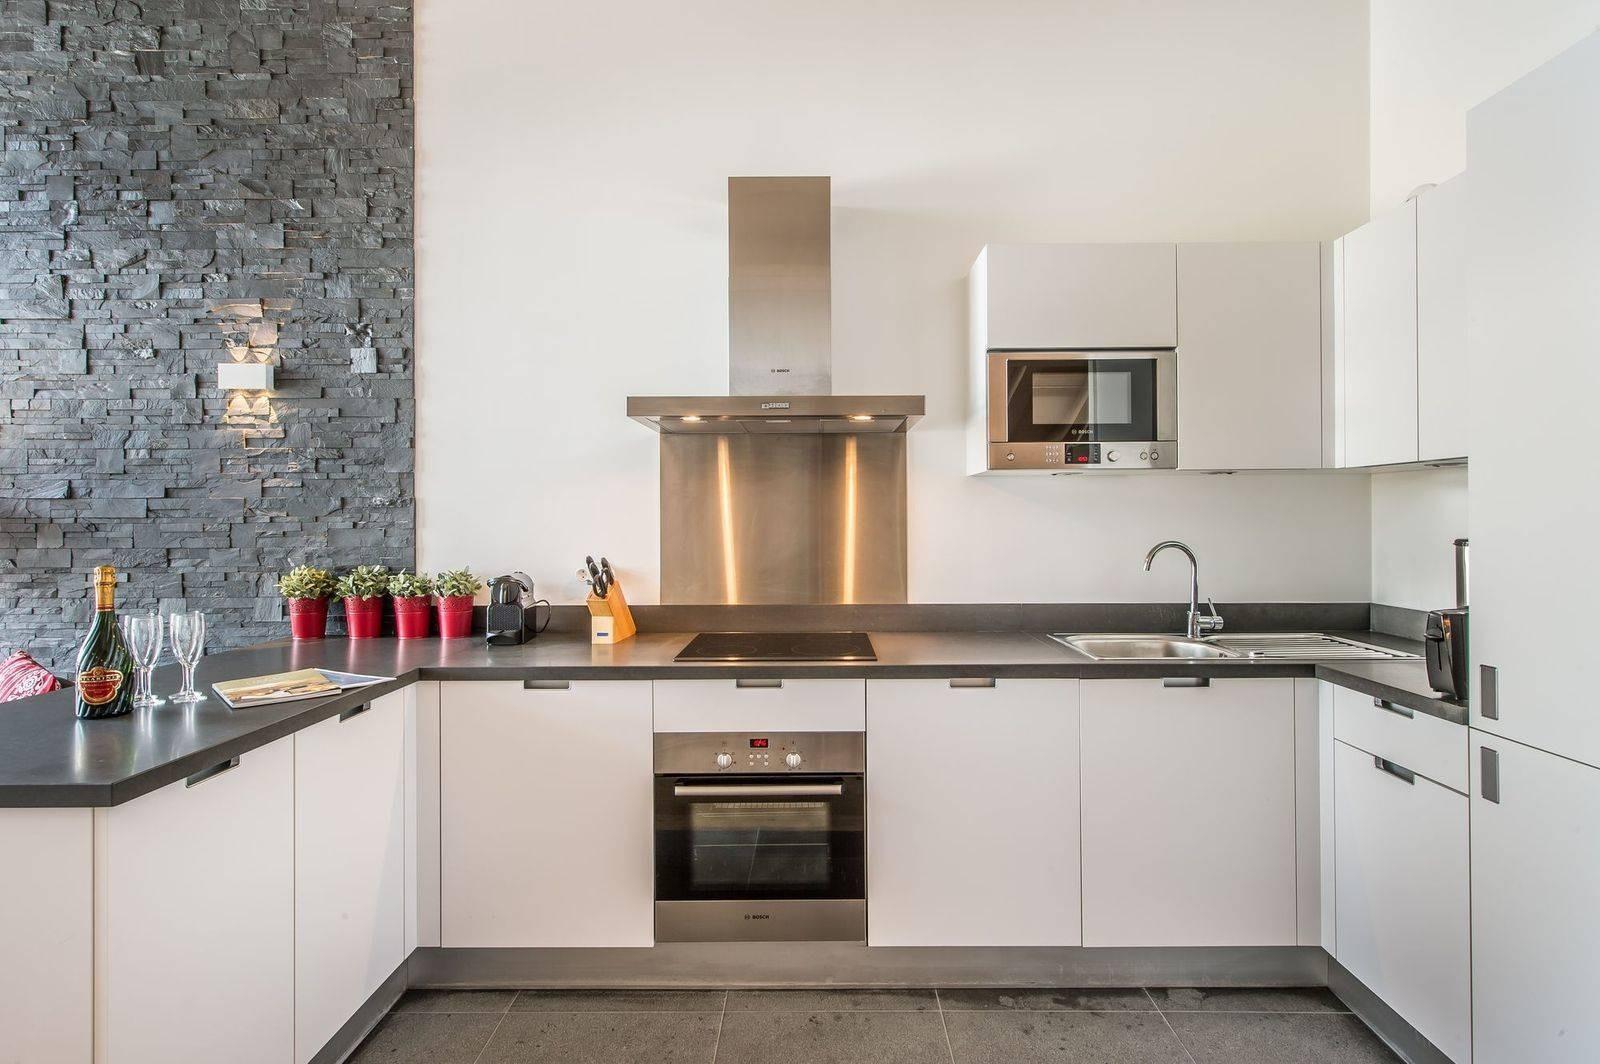 Courchevel 1650 Location Appartement Luxe Tengerite Cuisine